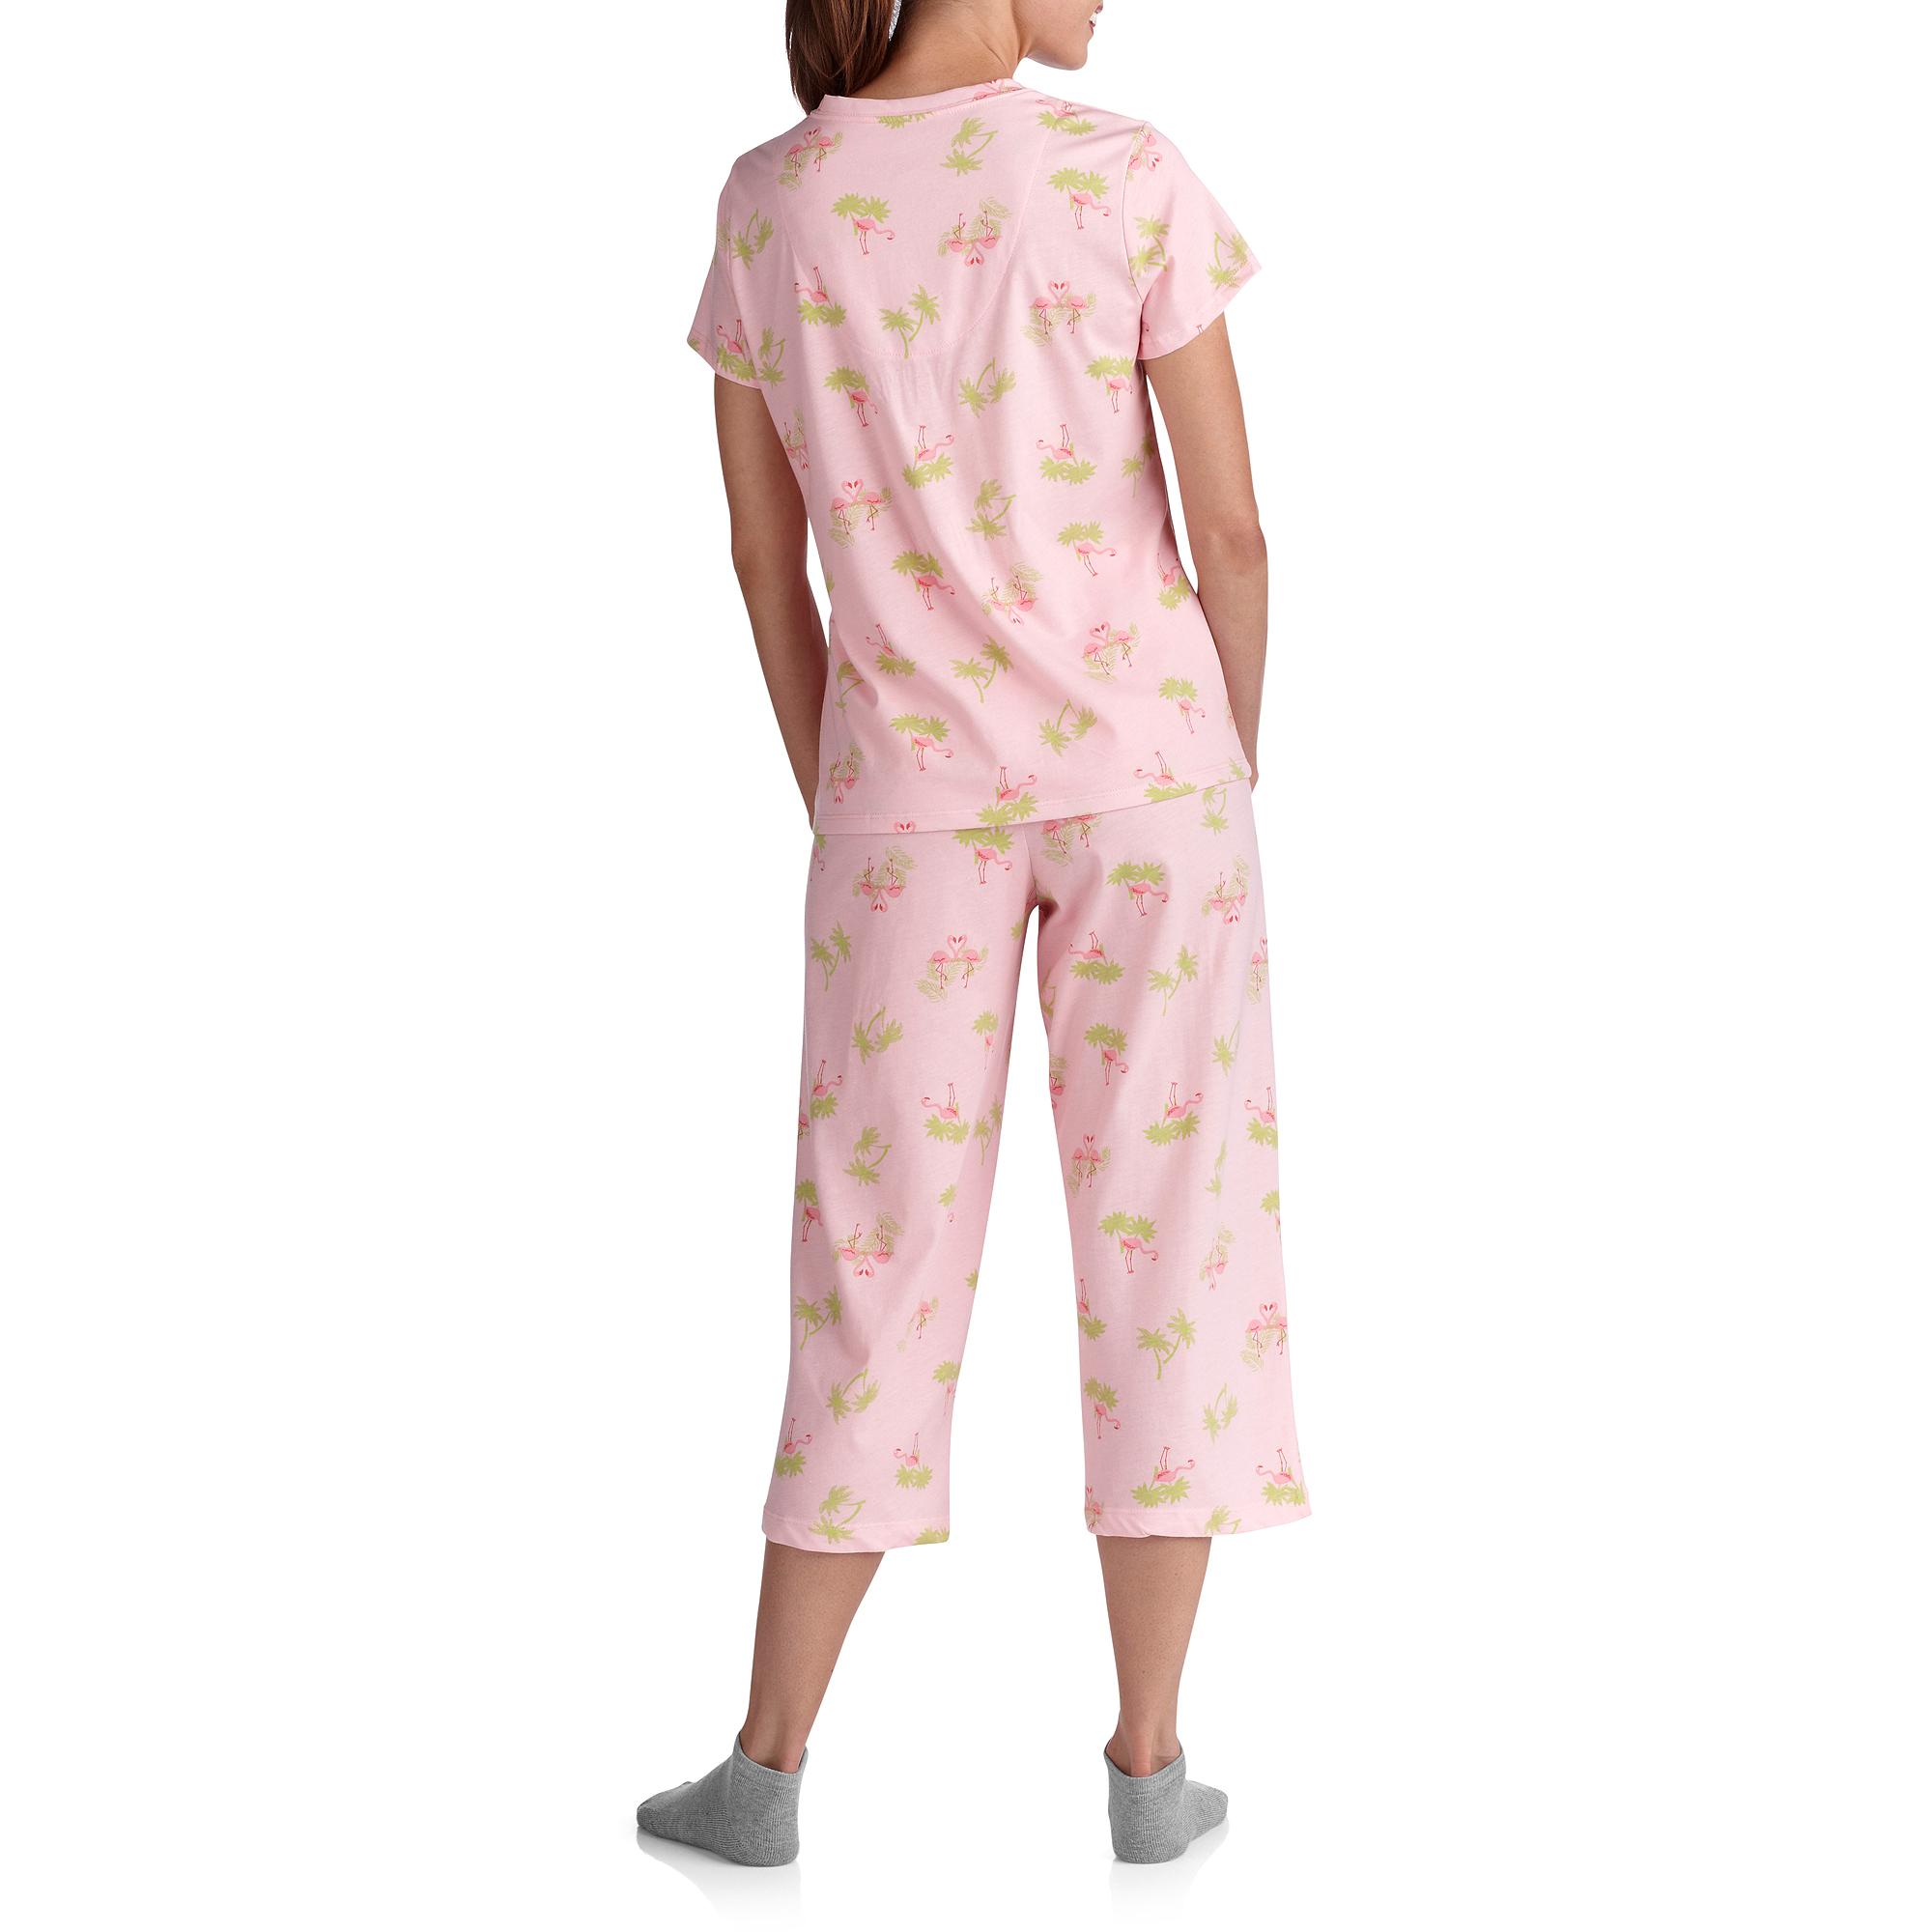 White Stag Women's Plus V Neck Sleep Shirt and Pant PJ Set